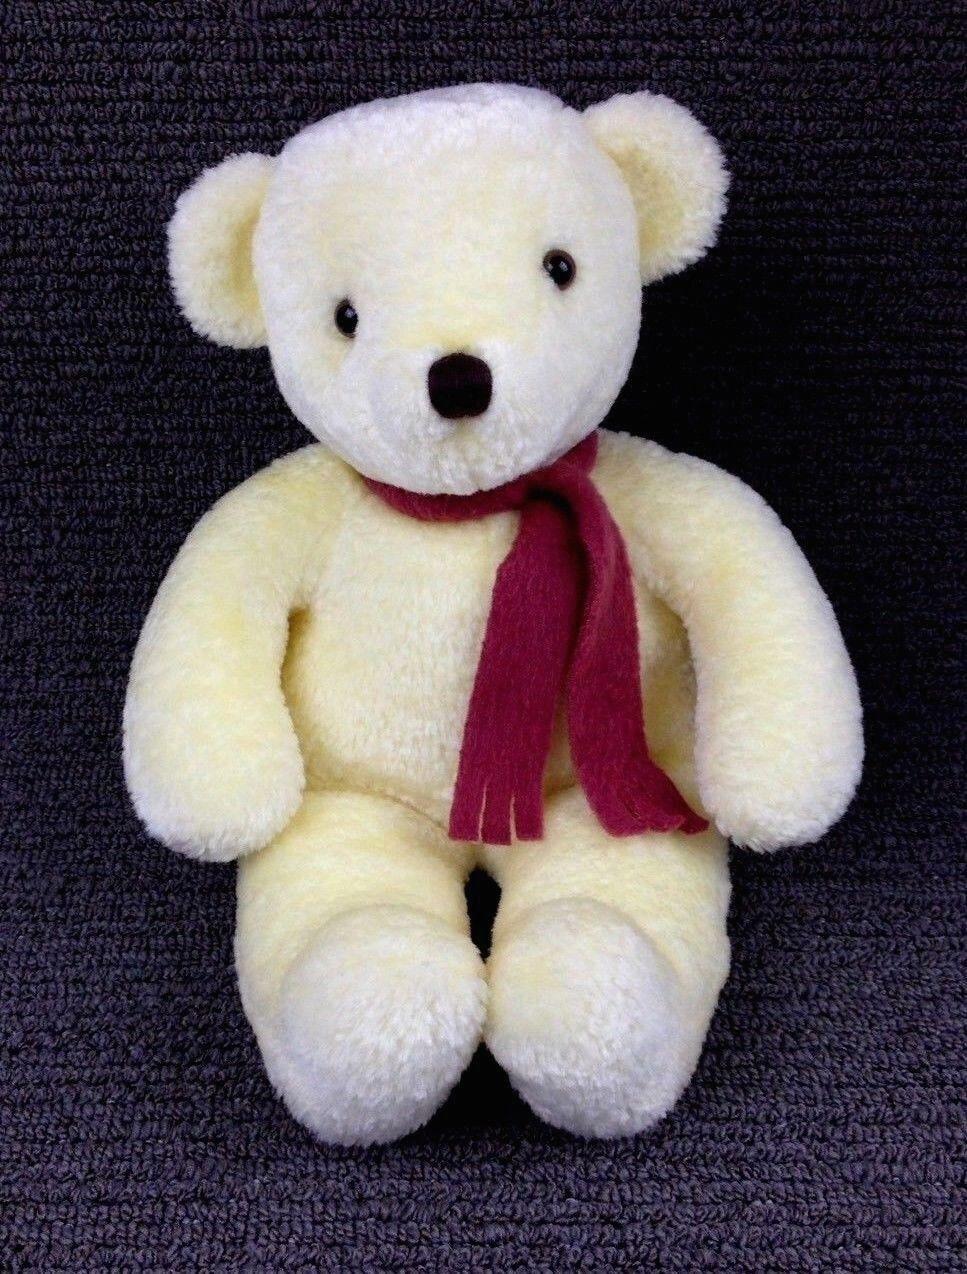 neal sofaworks teddy sofa style dog bed mary meyer vintage 1999 bear 13 plush stuffed animal yellow